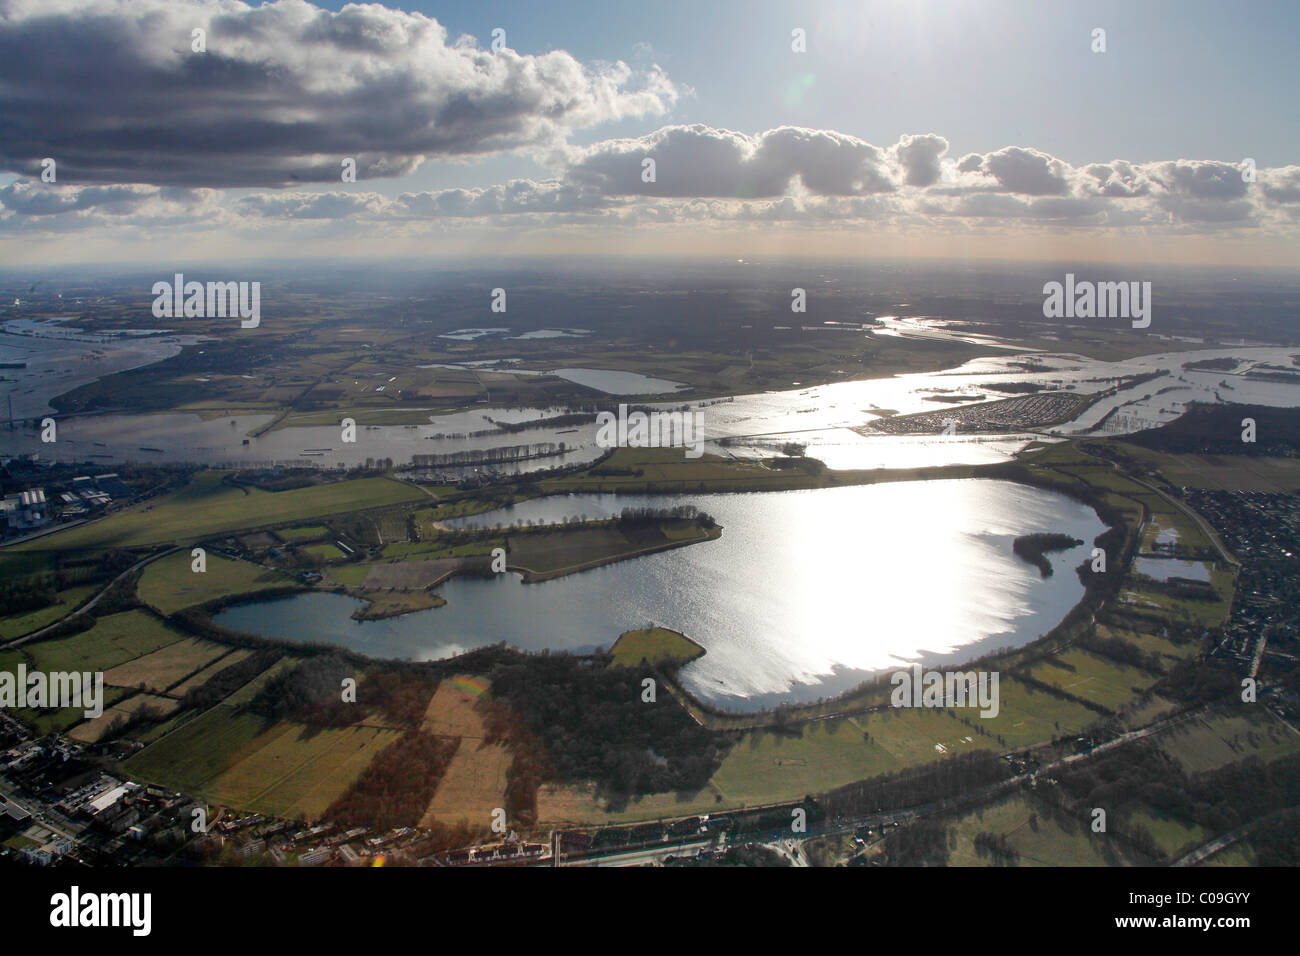 Aerial view, draining off high water, Rhine flood, Kartaeuser Gravinsel island, Wesel, Niederrhein region, Ruhrgebiet - Stock Image